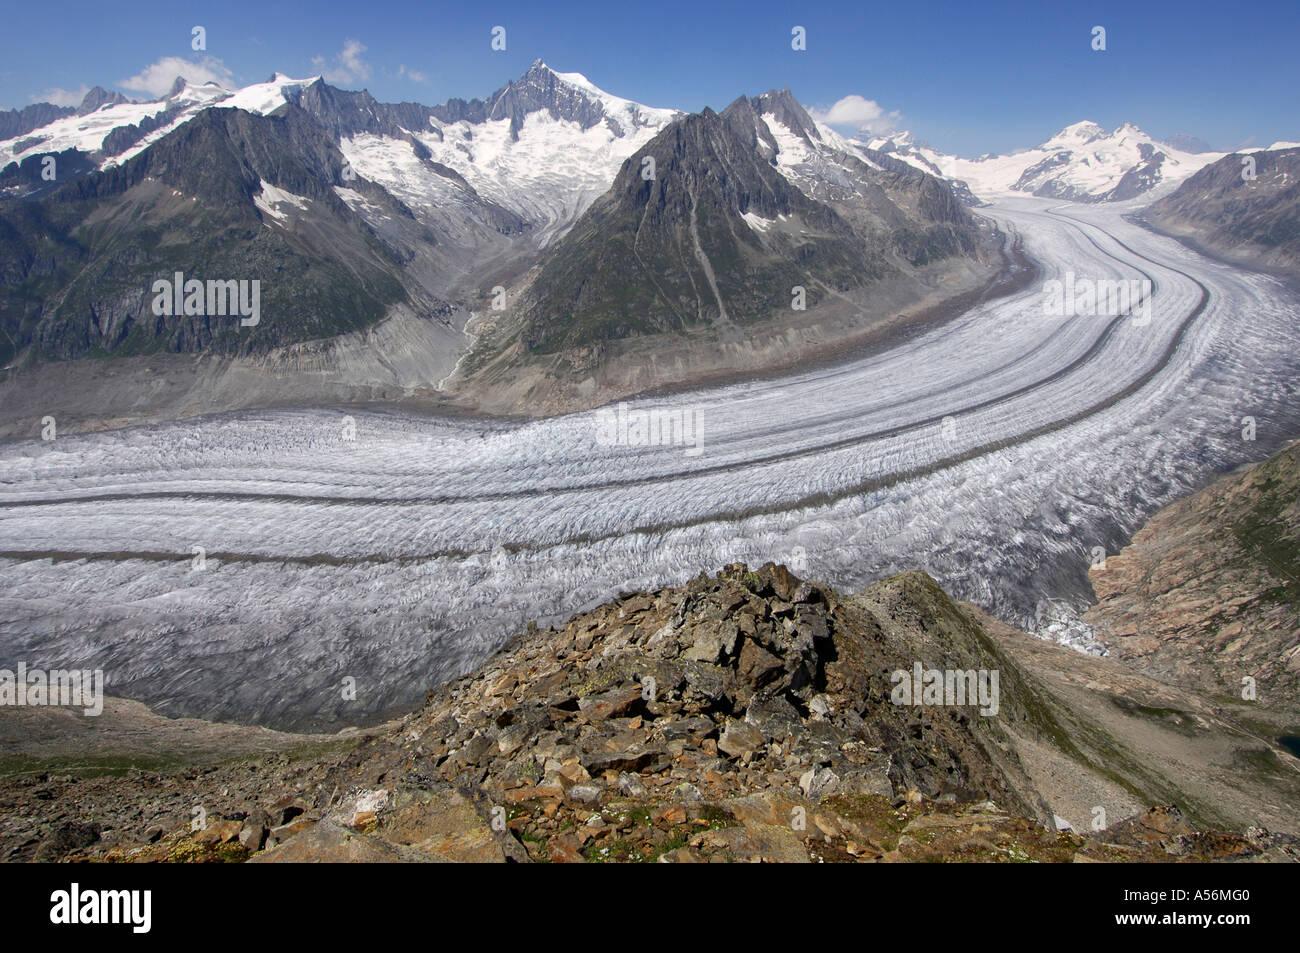 Glacier Aletsch Wallis Switzerland - Stock Image